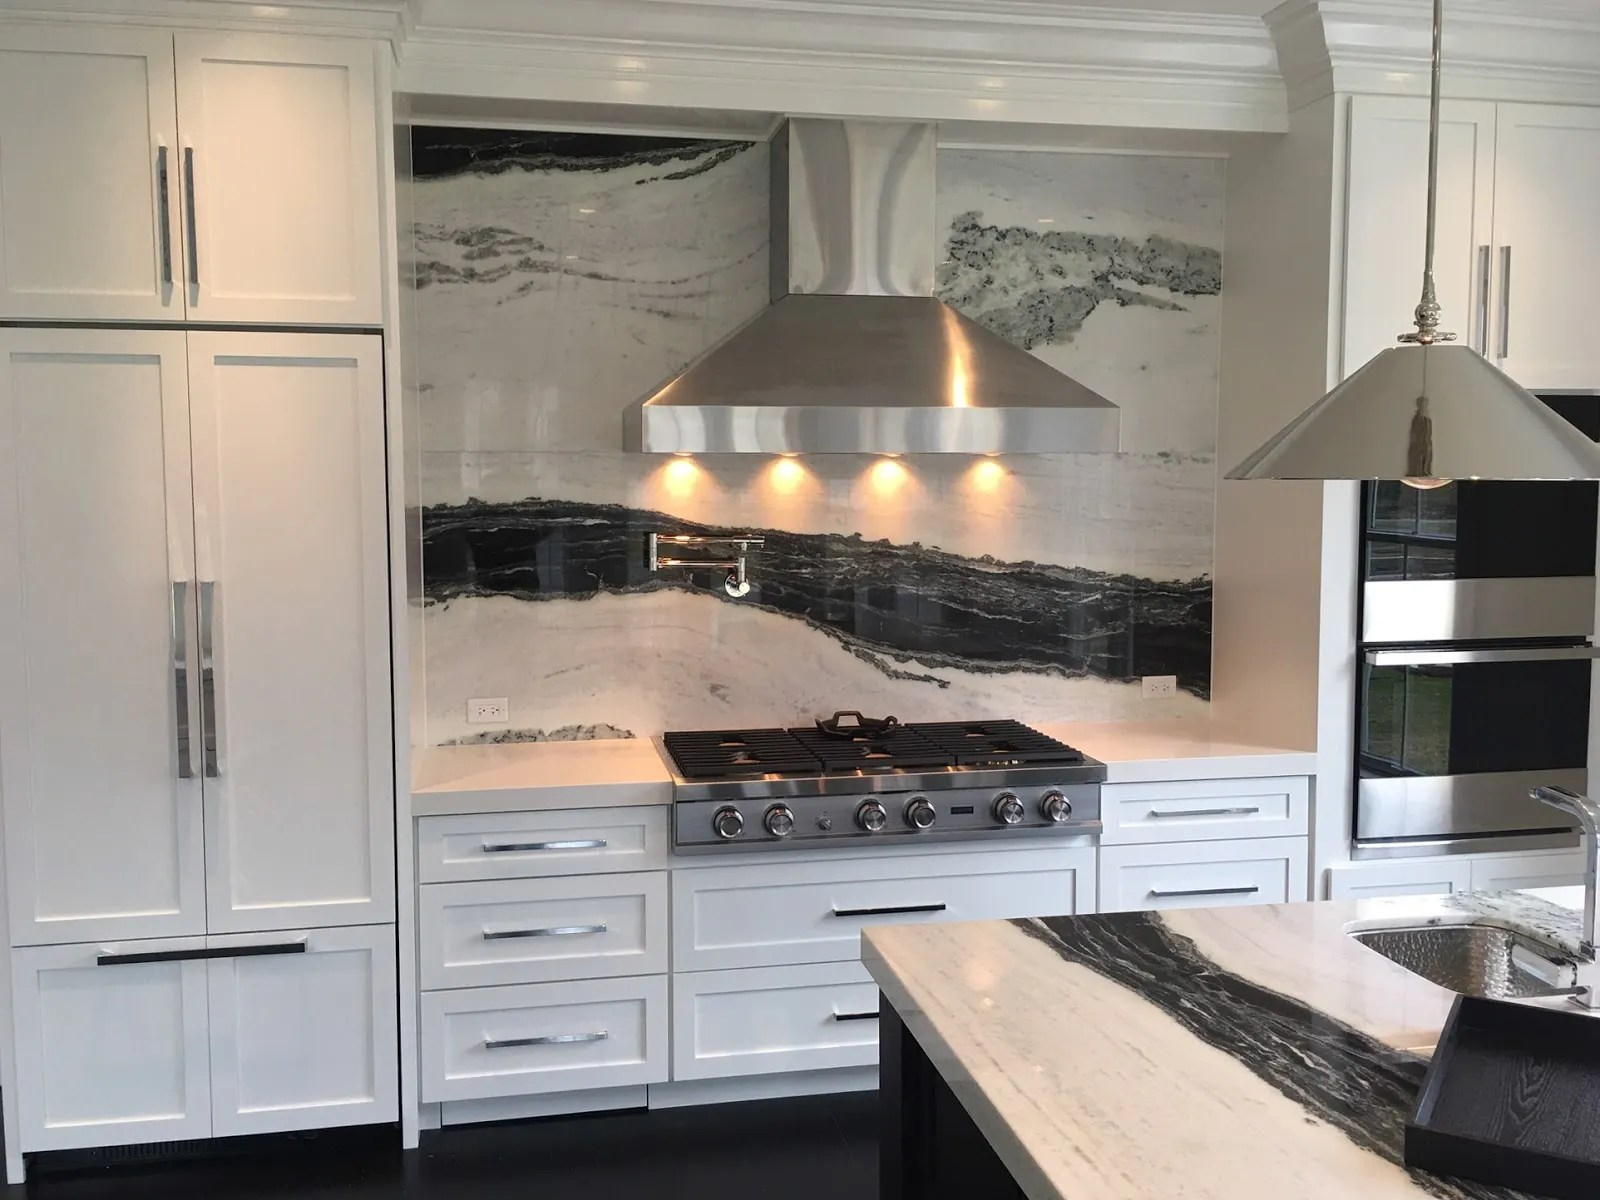 111 inspirational kitchen hood ideas